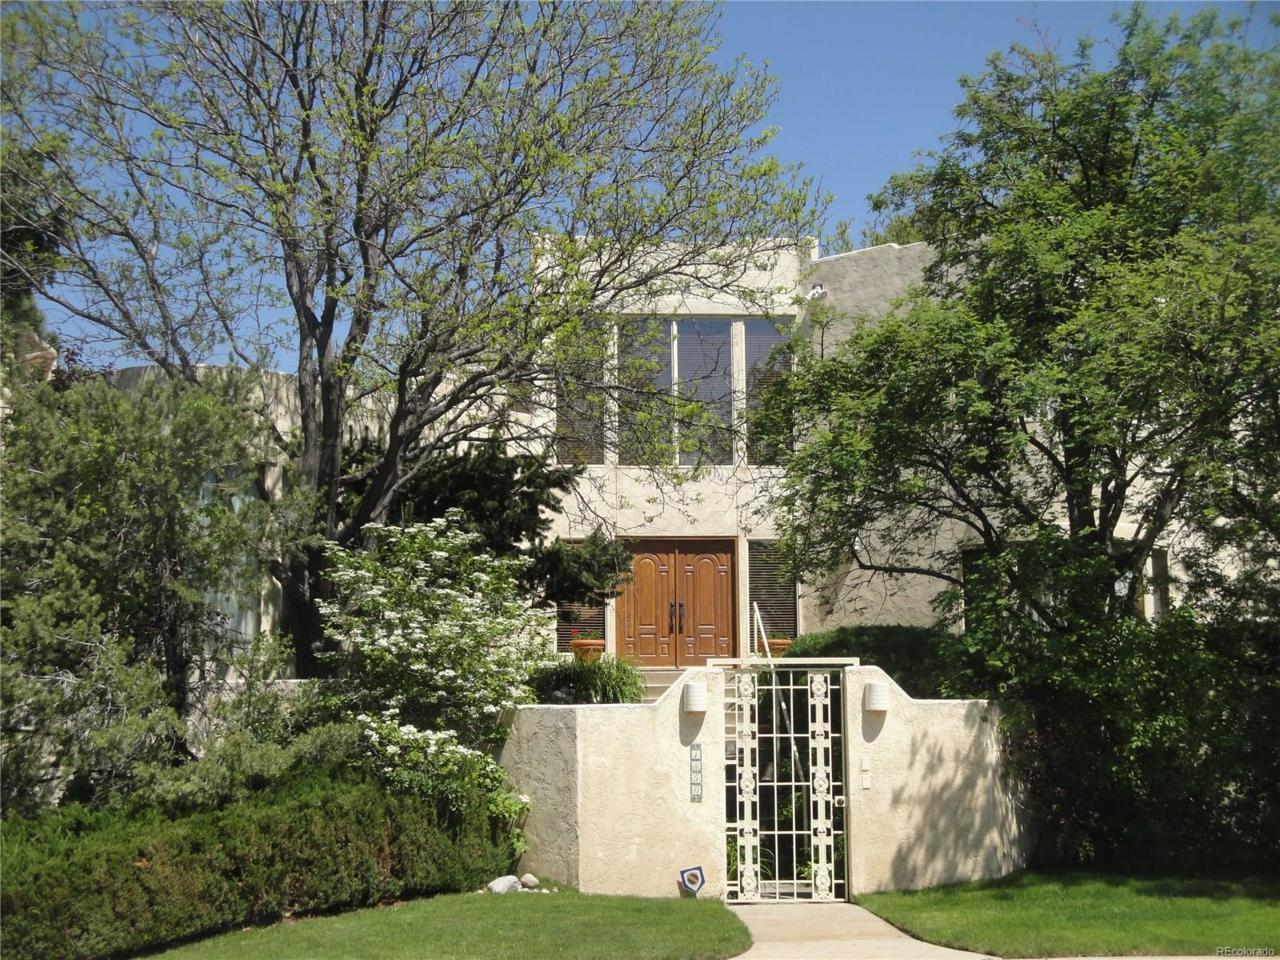 1850 S Xenia Court, Denver, CO 80231 (MLS #9270453) :: 8z Real Estate